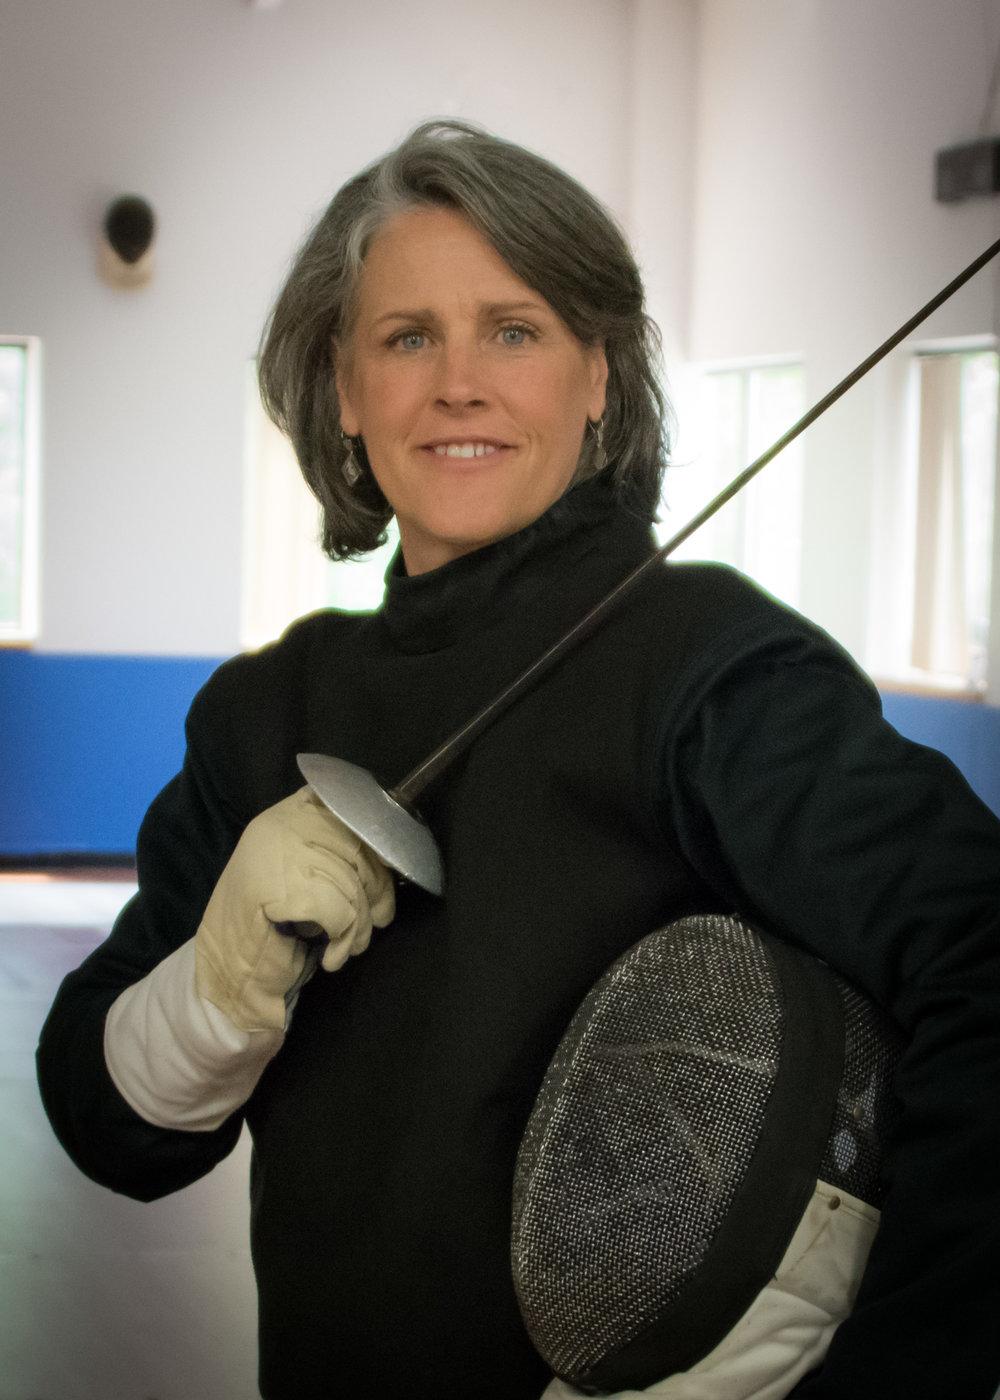 Motivational Speaker Fencing Coach, Vivo Fencing Club -